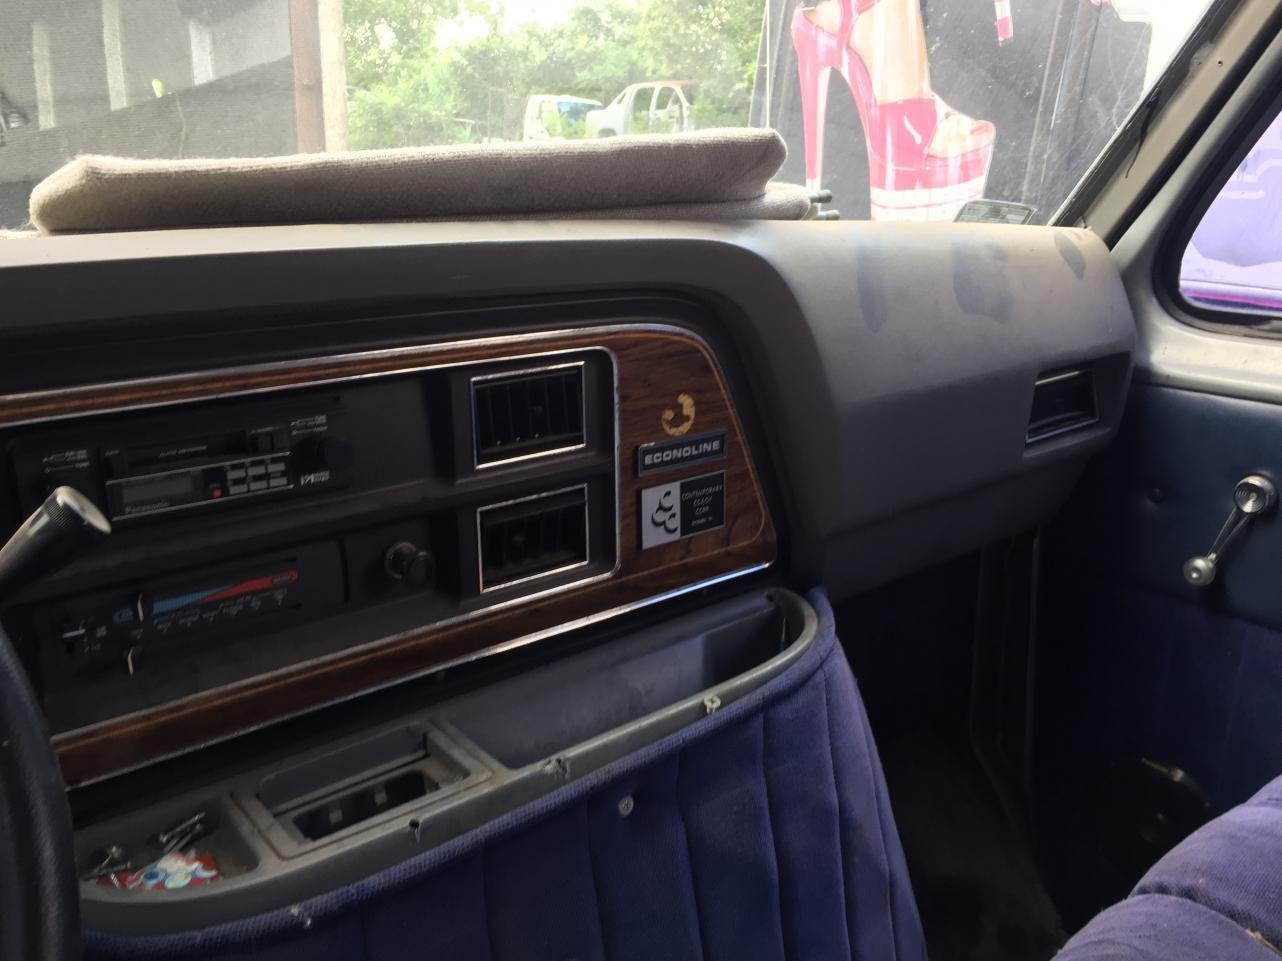 Junkyard adventure: Van 2 found some grey trim and steering wheel cover.